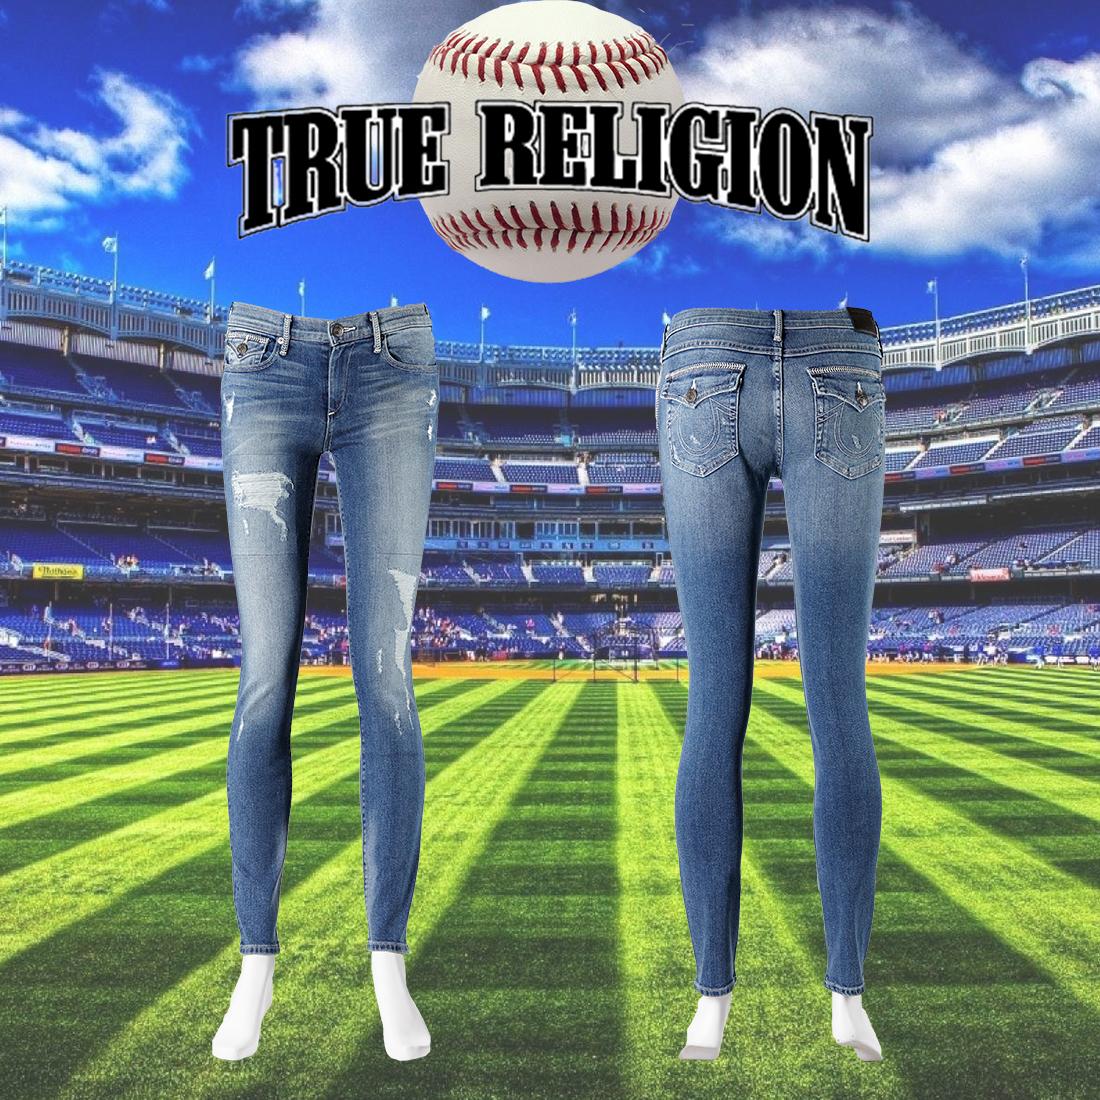 TRUE RELIGION Halle Baseball Stitched 系列 手工刷破 極窄管牛仔褲 美國製造進口 現貨供應【美國好褲】